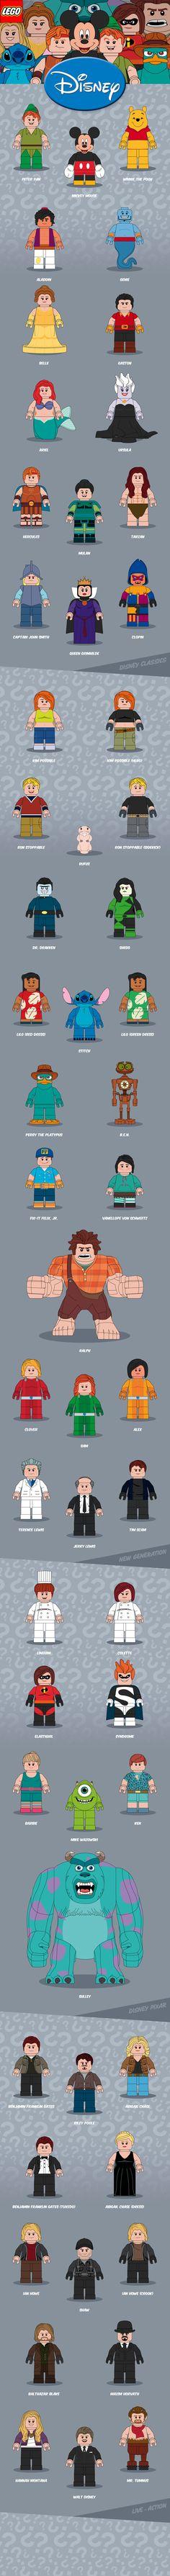 Disney // LEGO Minifigures on Behance